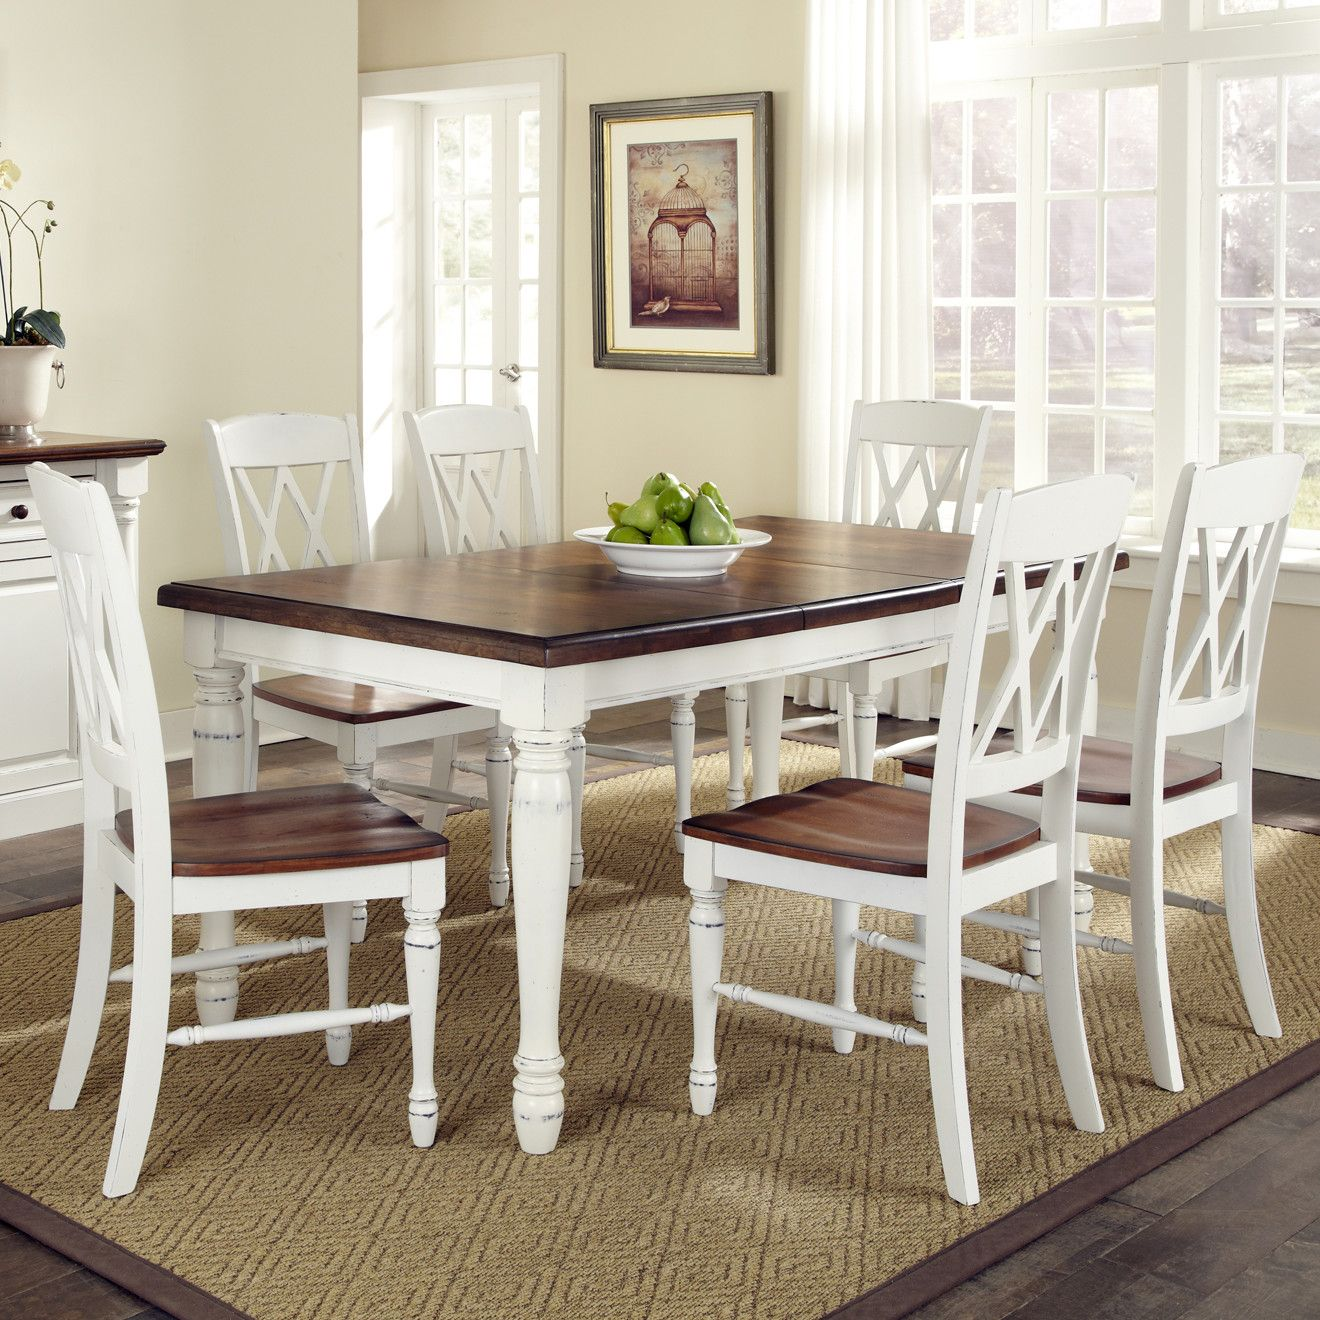 Home styles monarch 7 piece dining set reviews wayfair for Weisser esszimmertisch